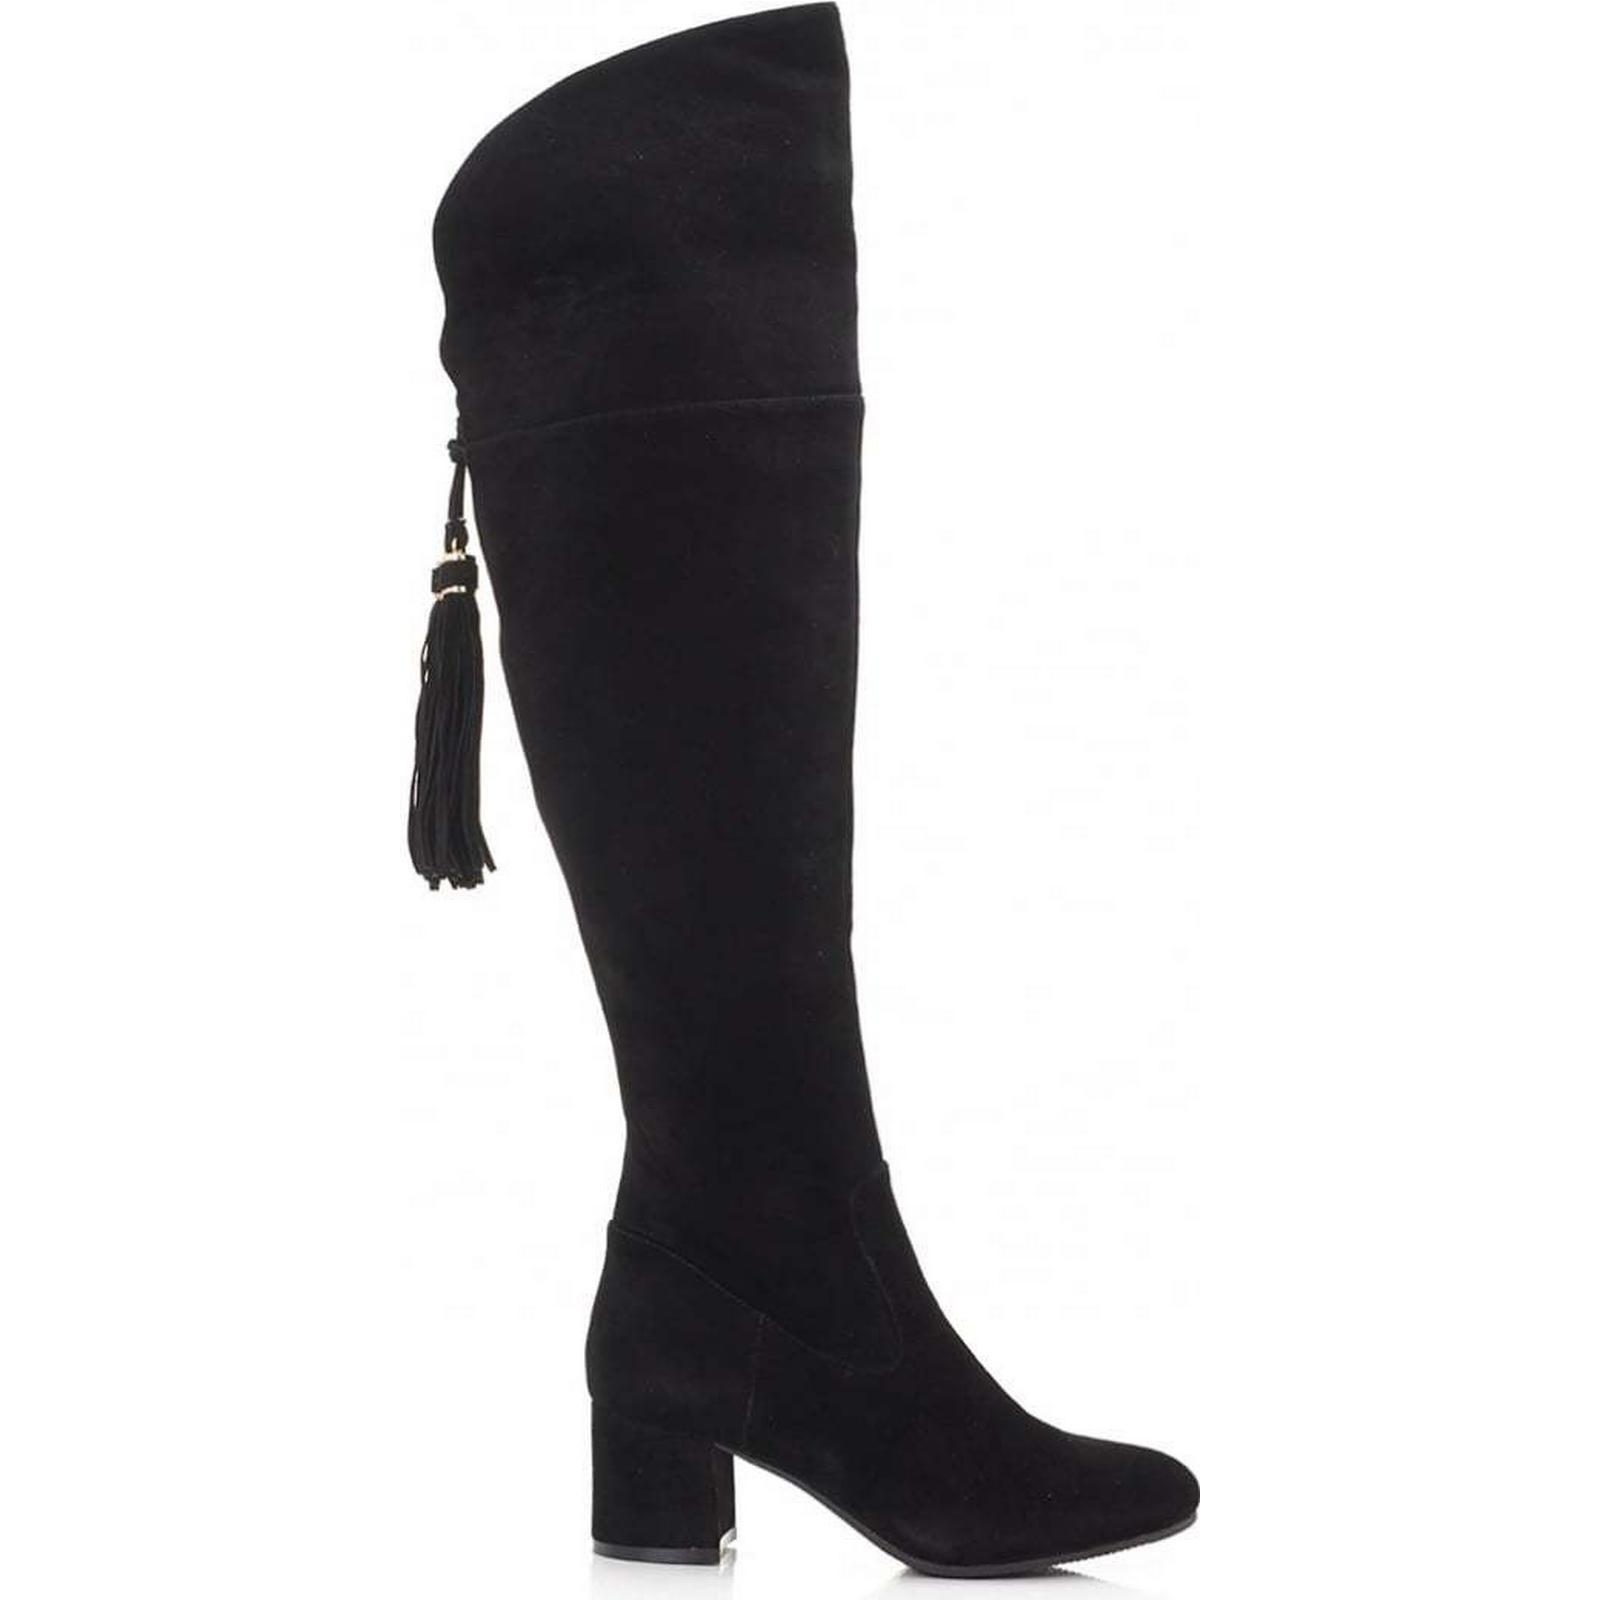 Moda In Low Pelle Suede Tassle Back Low In Heel Boots Colour: BLACK, Size: 5 082410